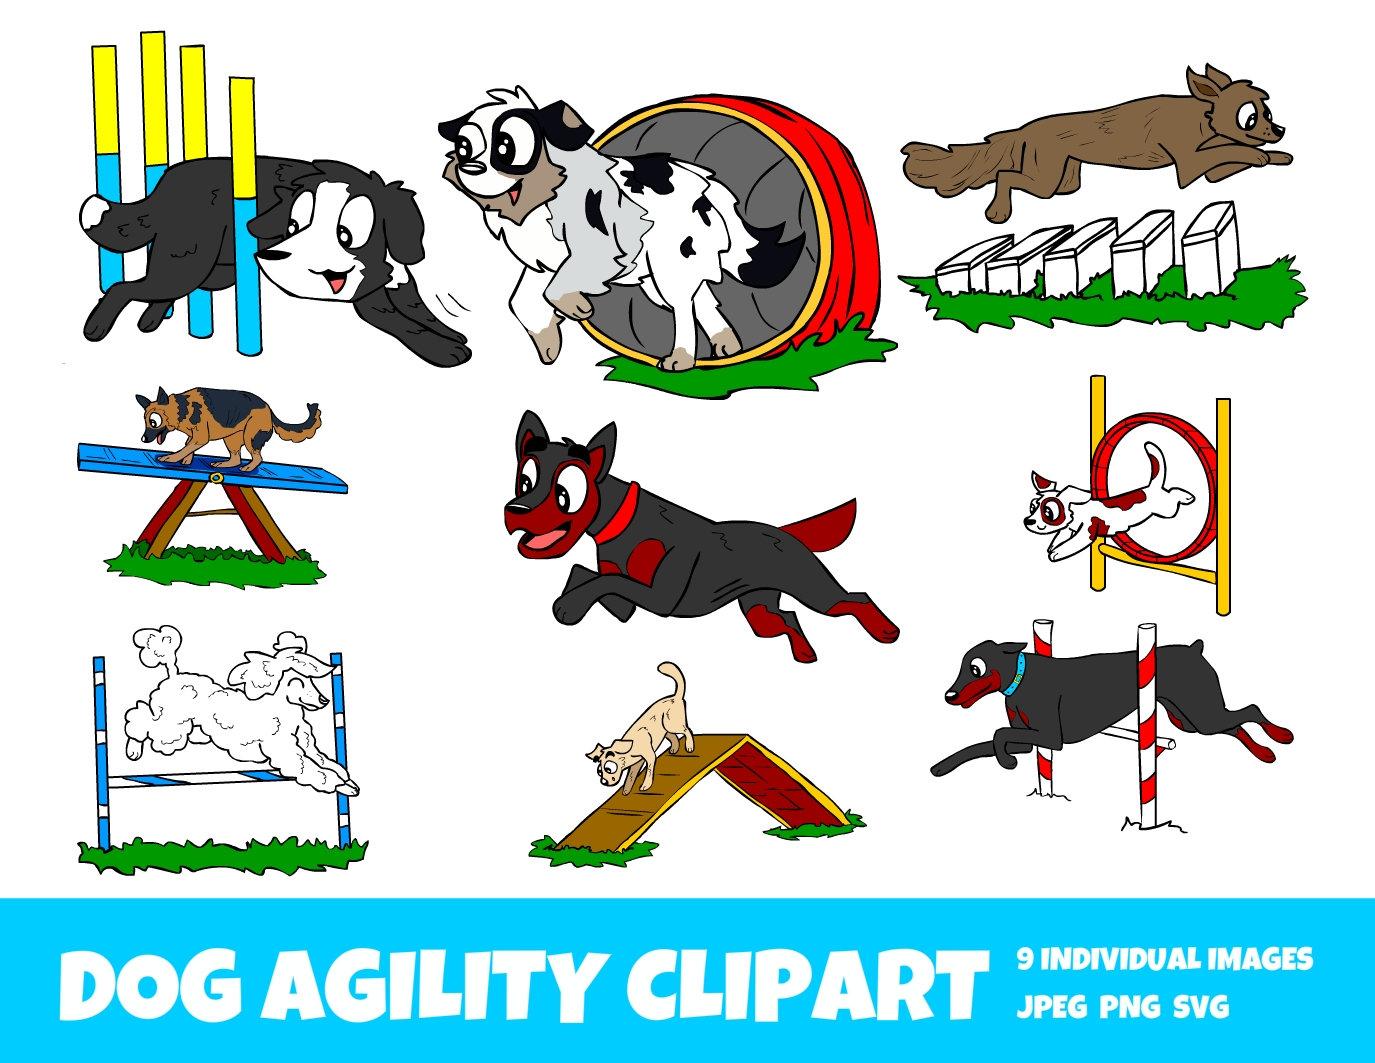 Dog Agility Clip Art Commercial Use OK Dog Sports Jumps Weave Seesaw Border  Collie Poodle Dobberman Huntawy.